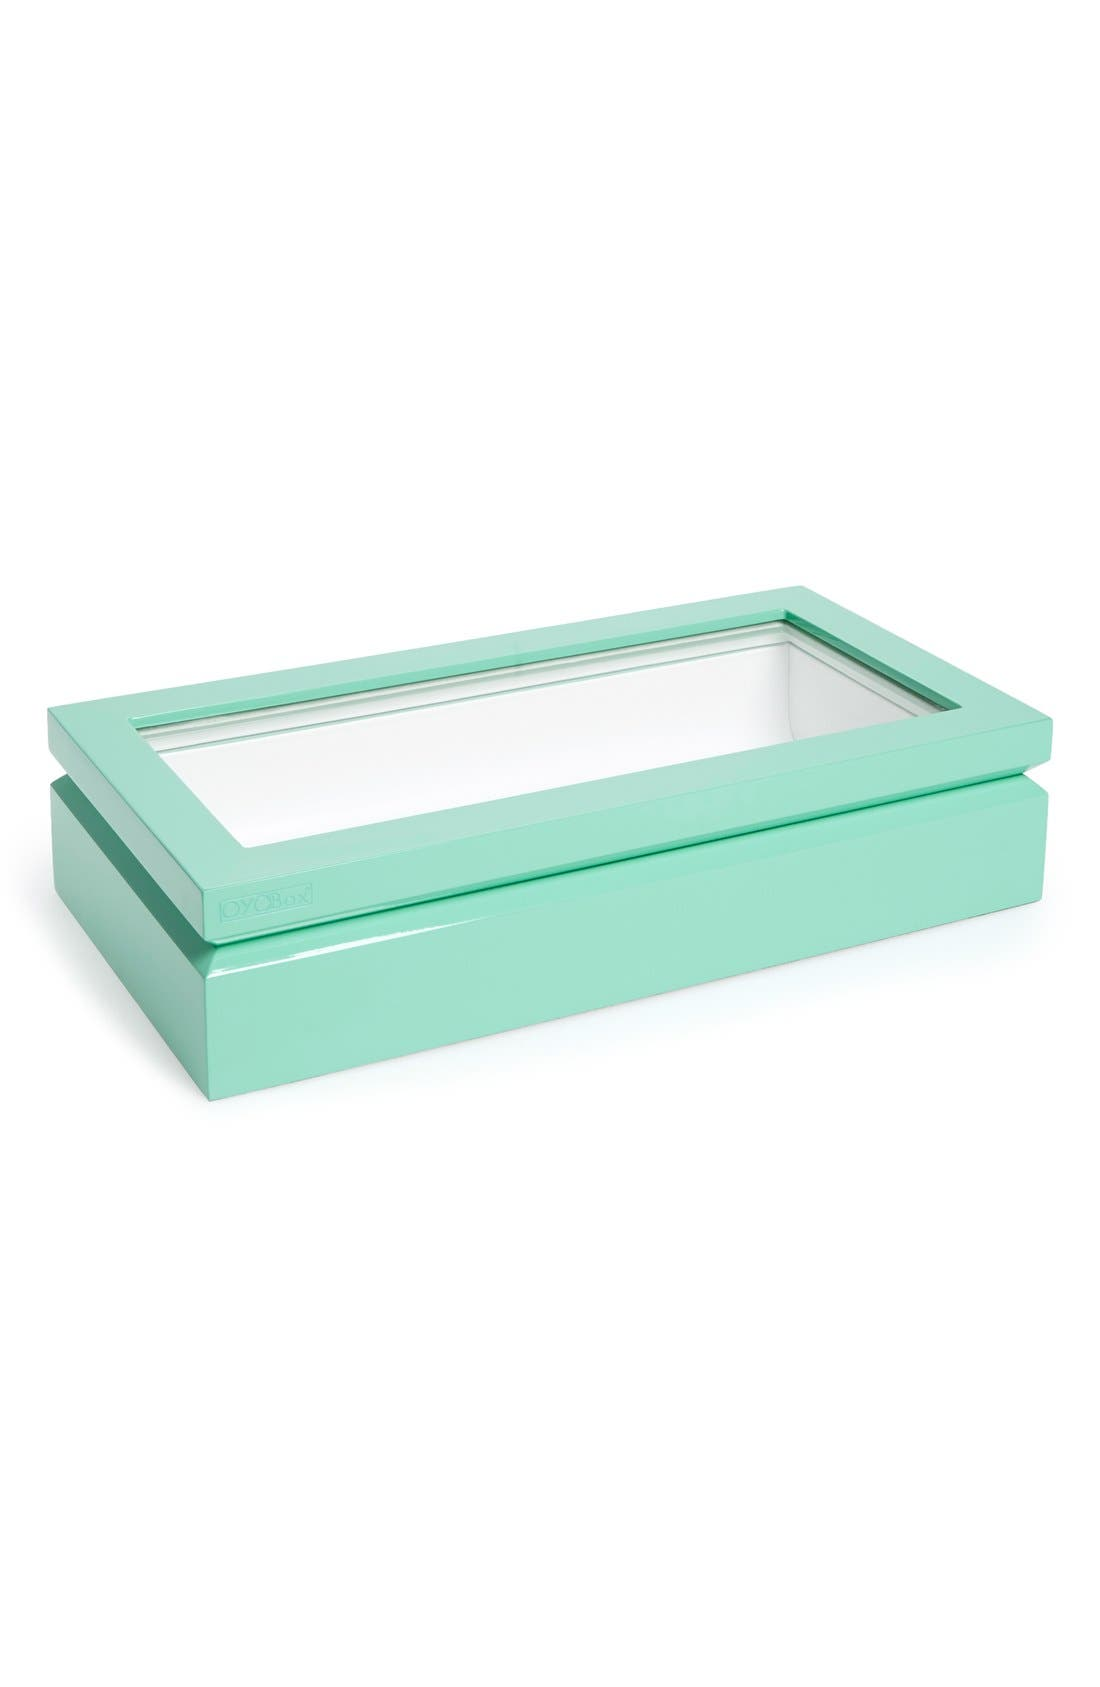 Lacquered Wood Window Top Eyewear Organizer Case,                         Main,                         color, Aqua